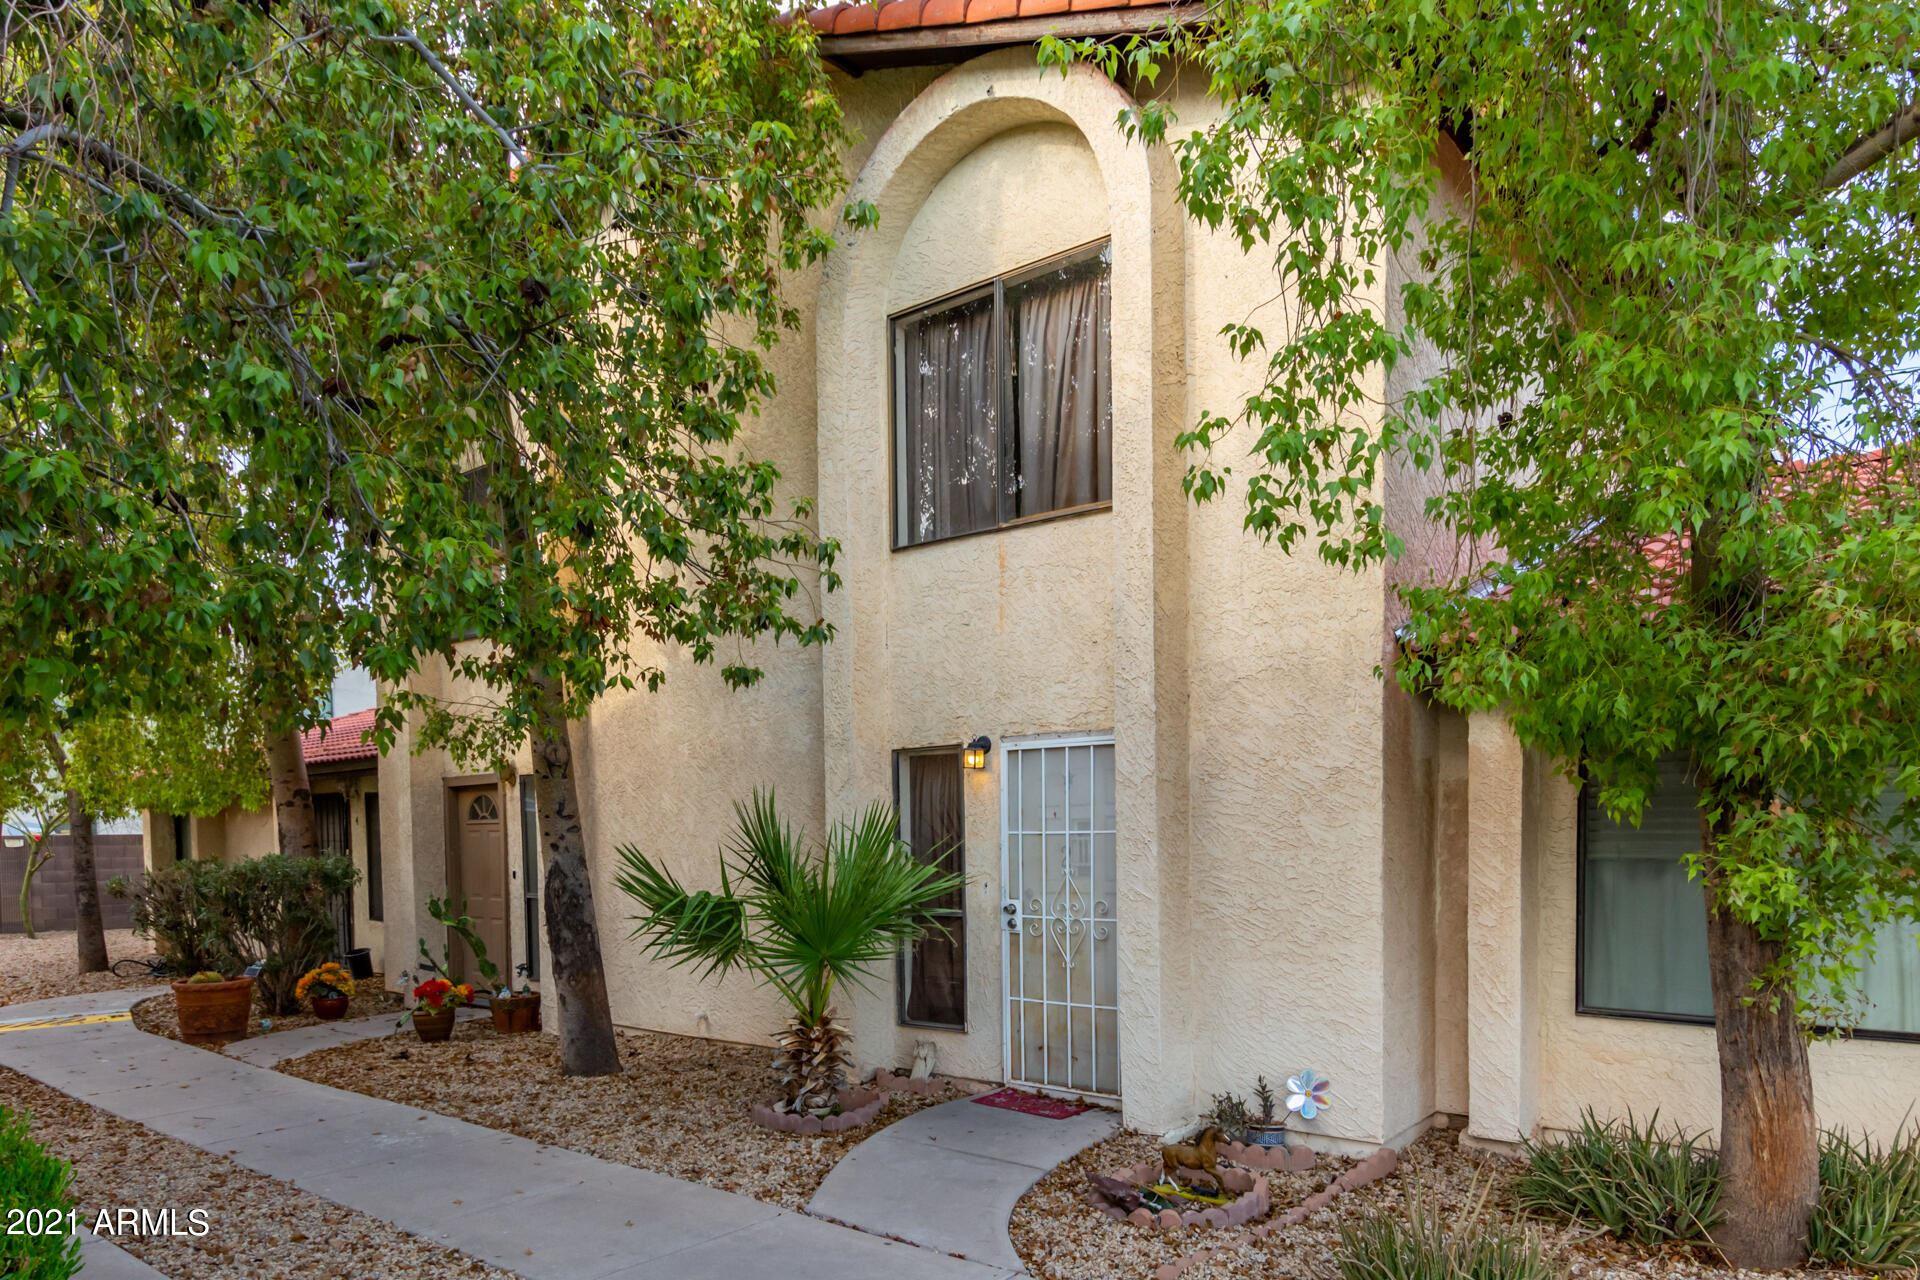 Photo of 2438 E TRACY Lane #2, Phoenix, AZ 85032 (MLS # 6307746)